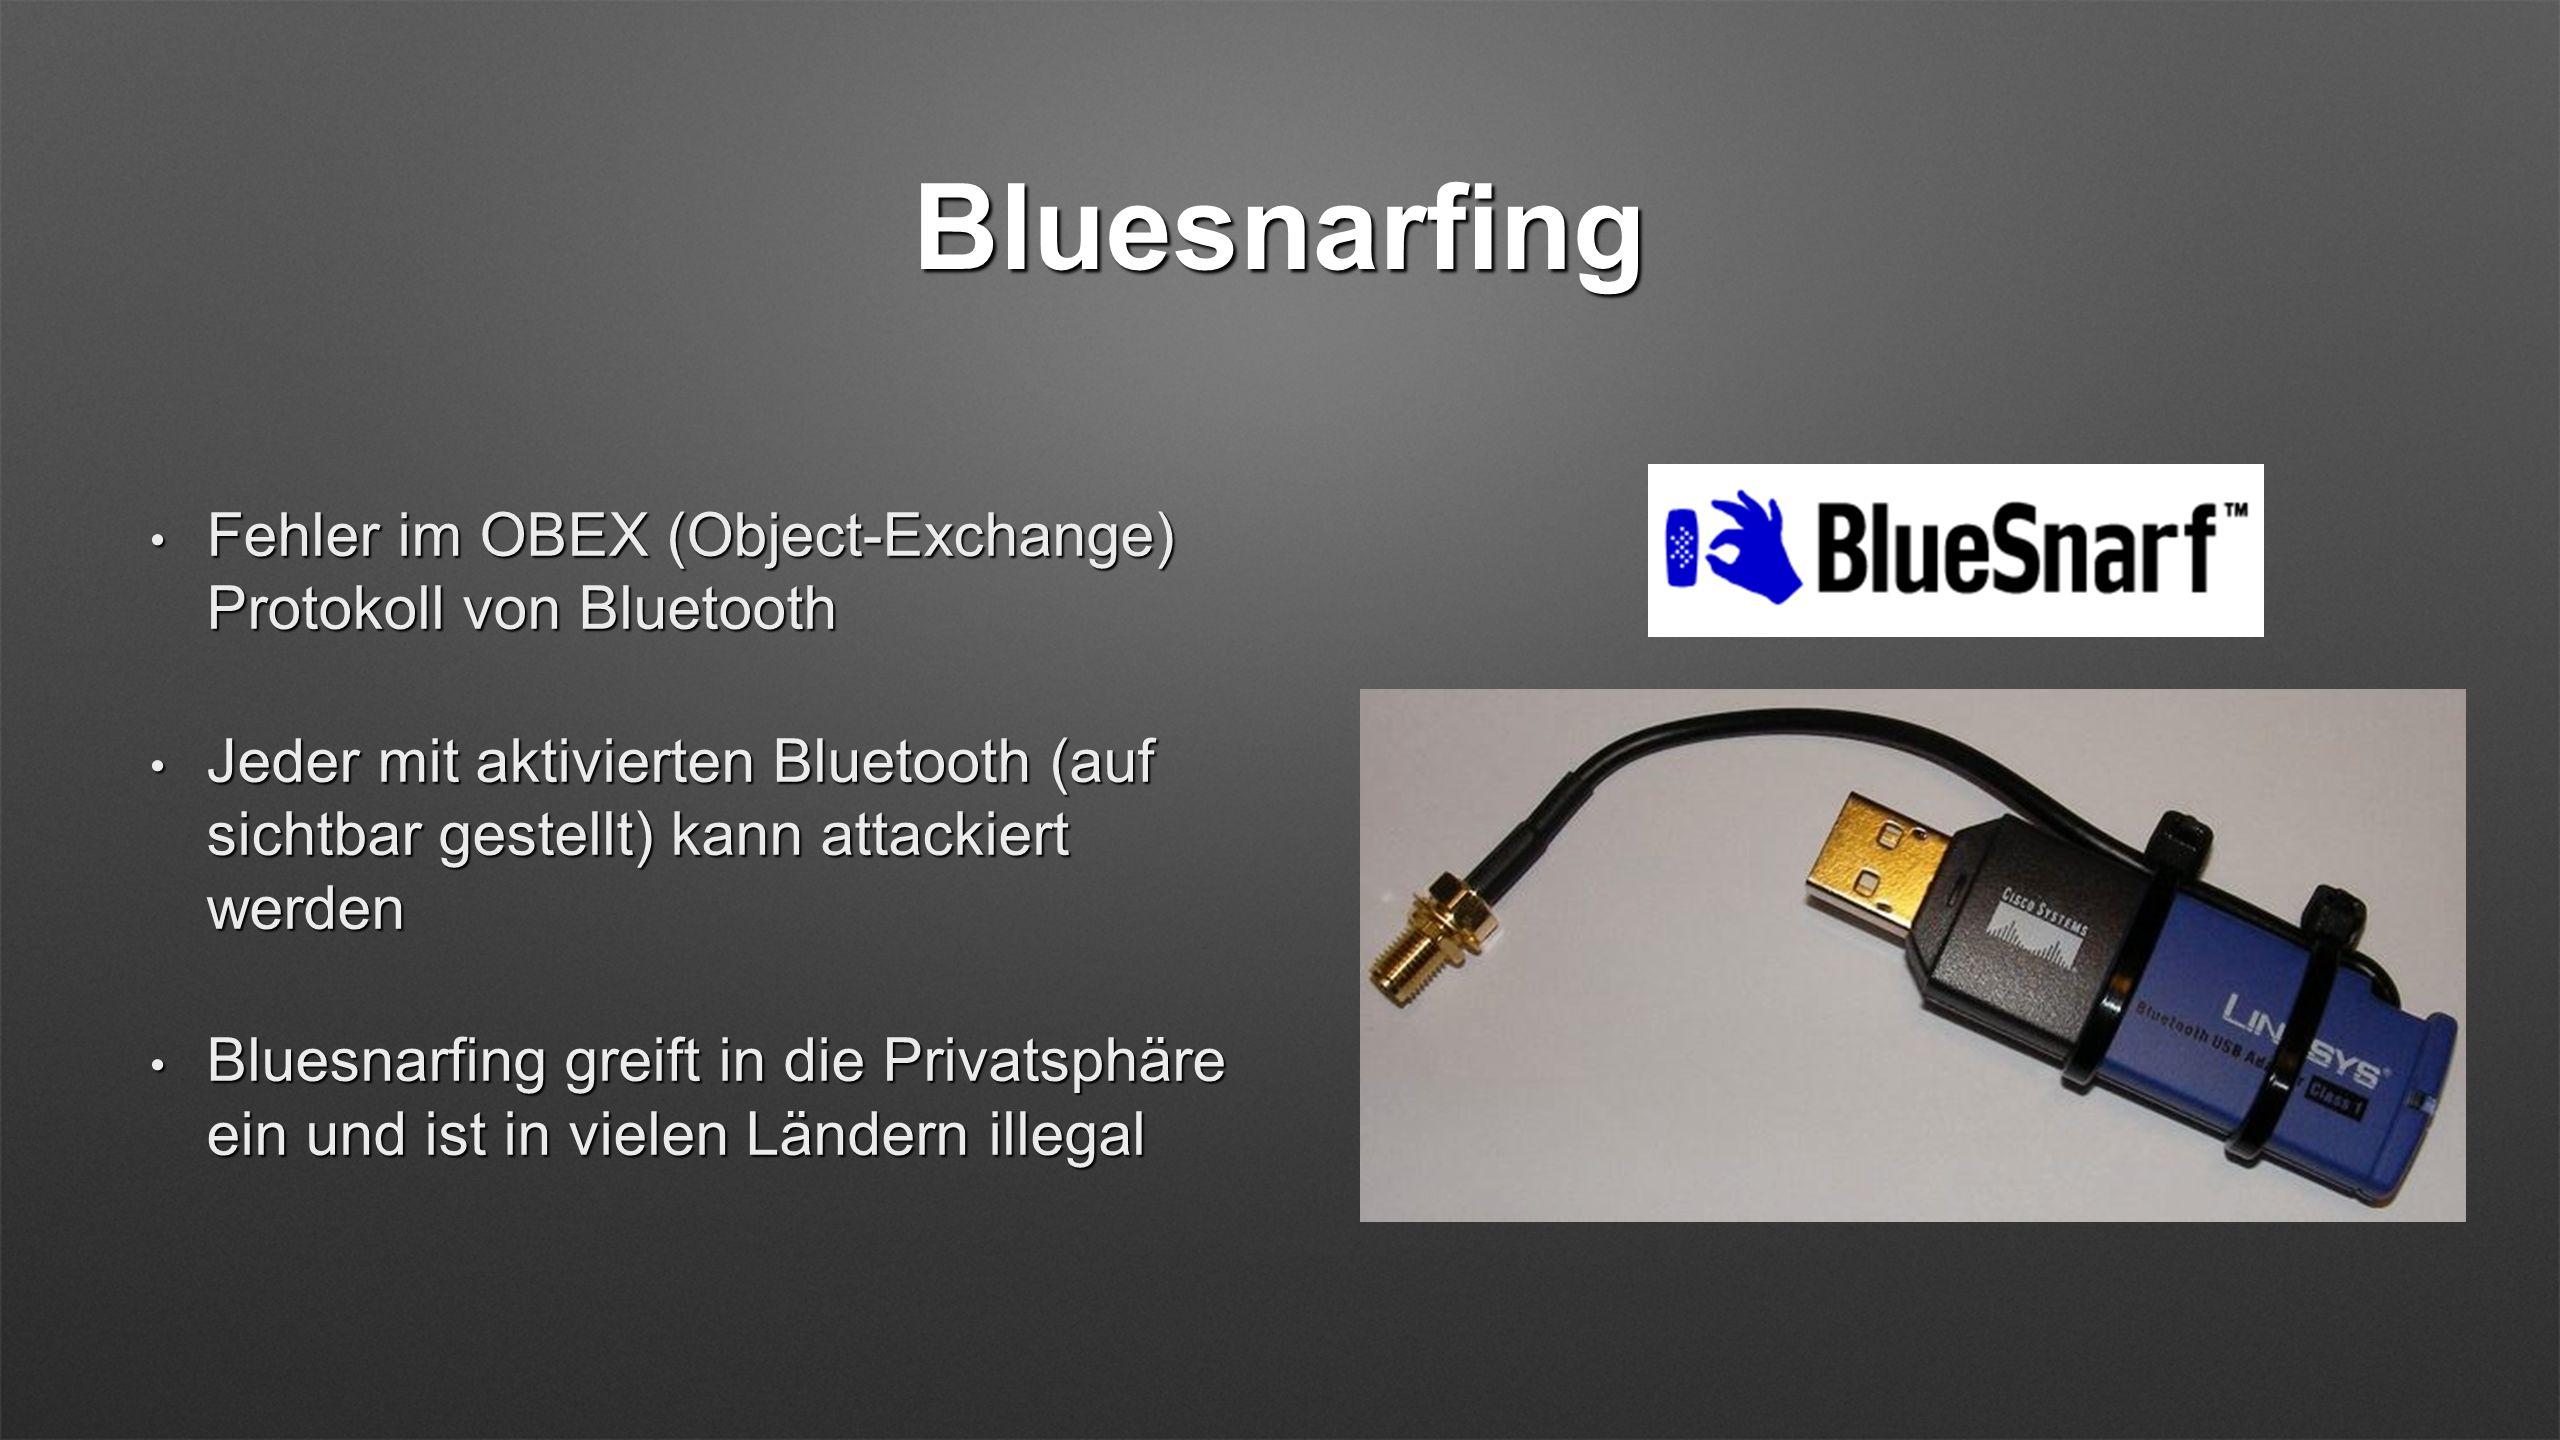 Bluesnarfing Fehler im OBEX (Object-Exchange) Protokoll von Bluetooth Fehler im OBEX (Object-Exchange) Protokoll von Bluetooth Jeder mit aktivierten B